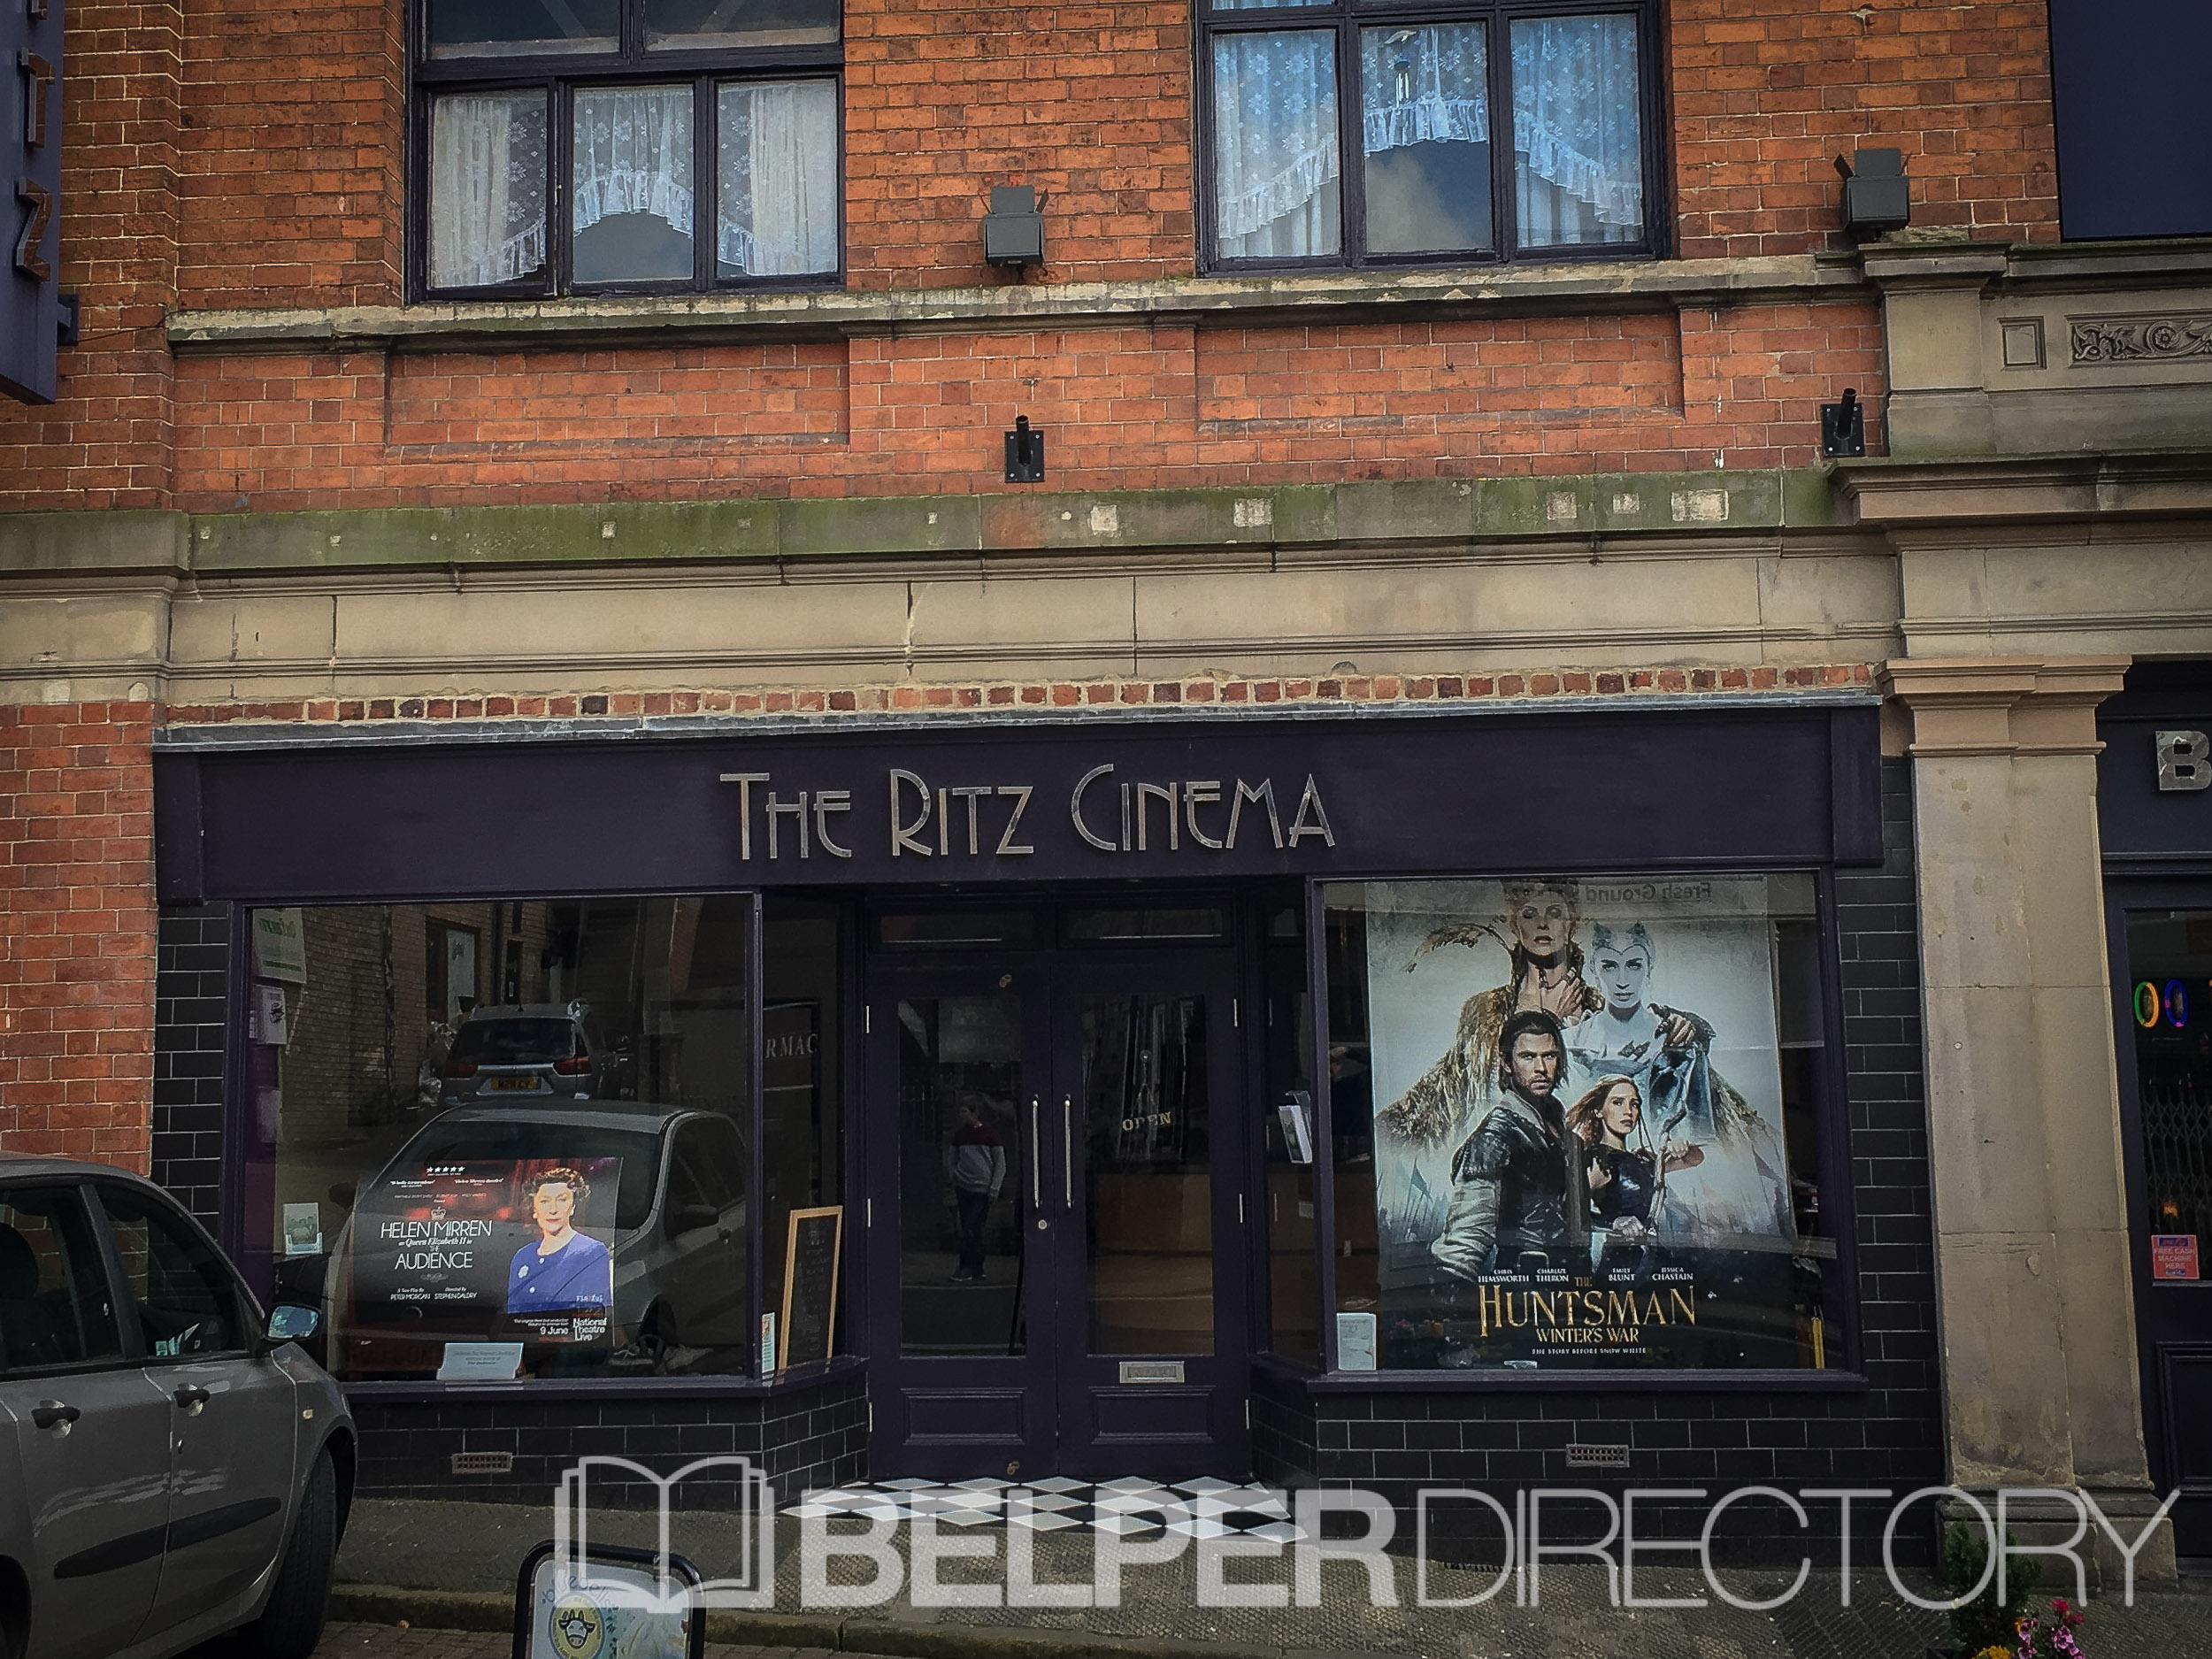 The Ritz Cinema Belper on Inter Search